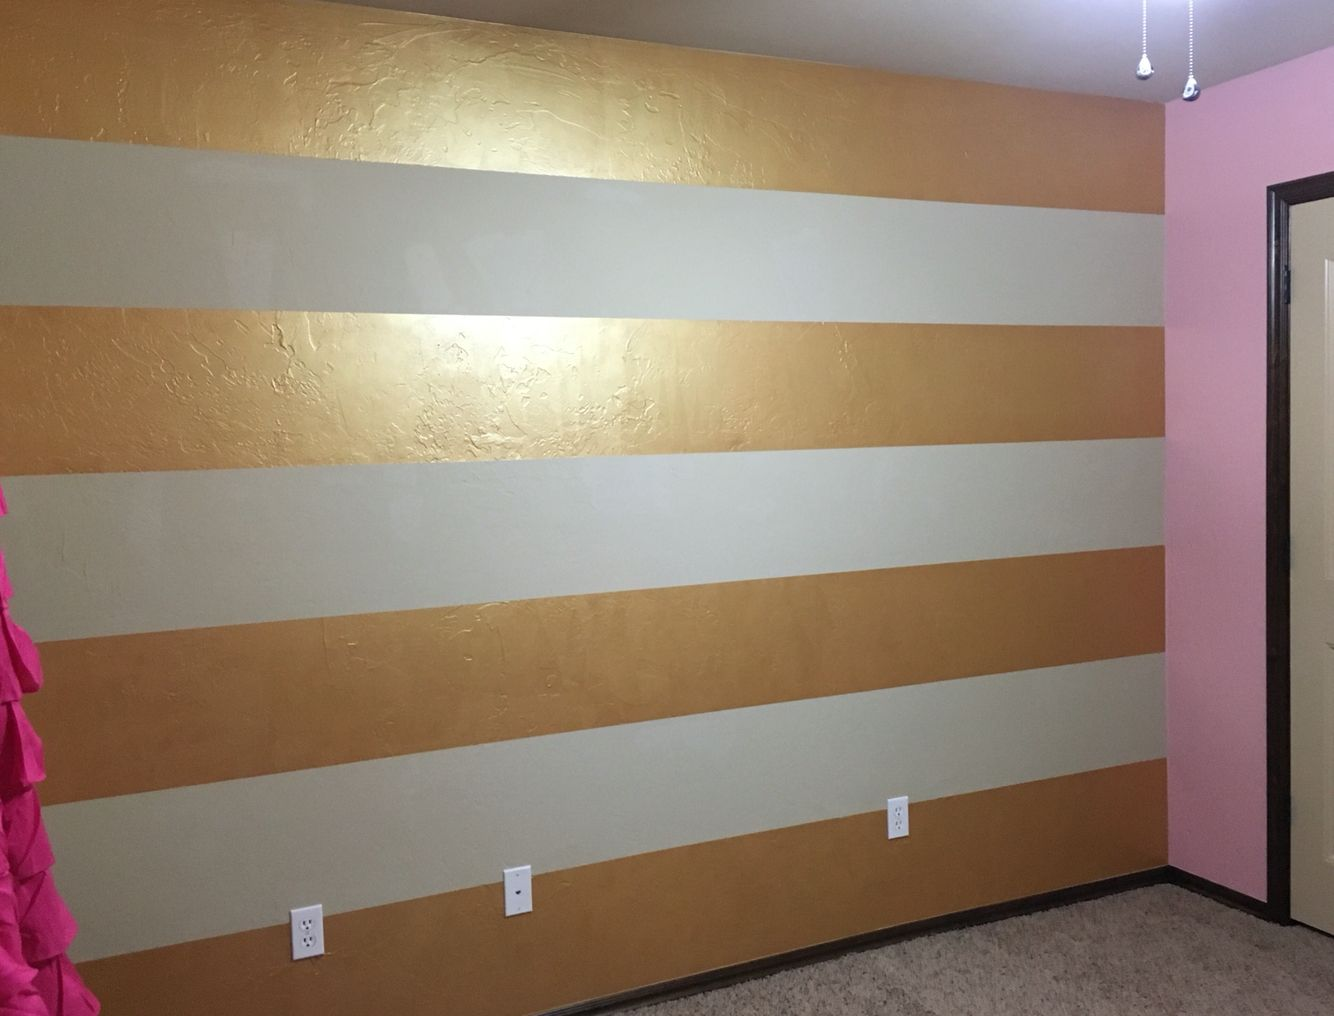 Sherwin Williams Metallic Impressions Gold Glaze Bedroom Wall